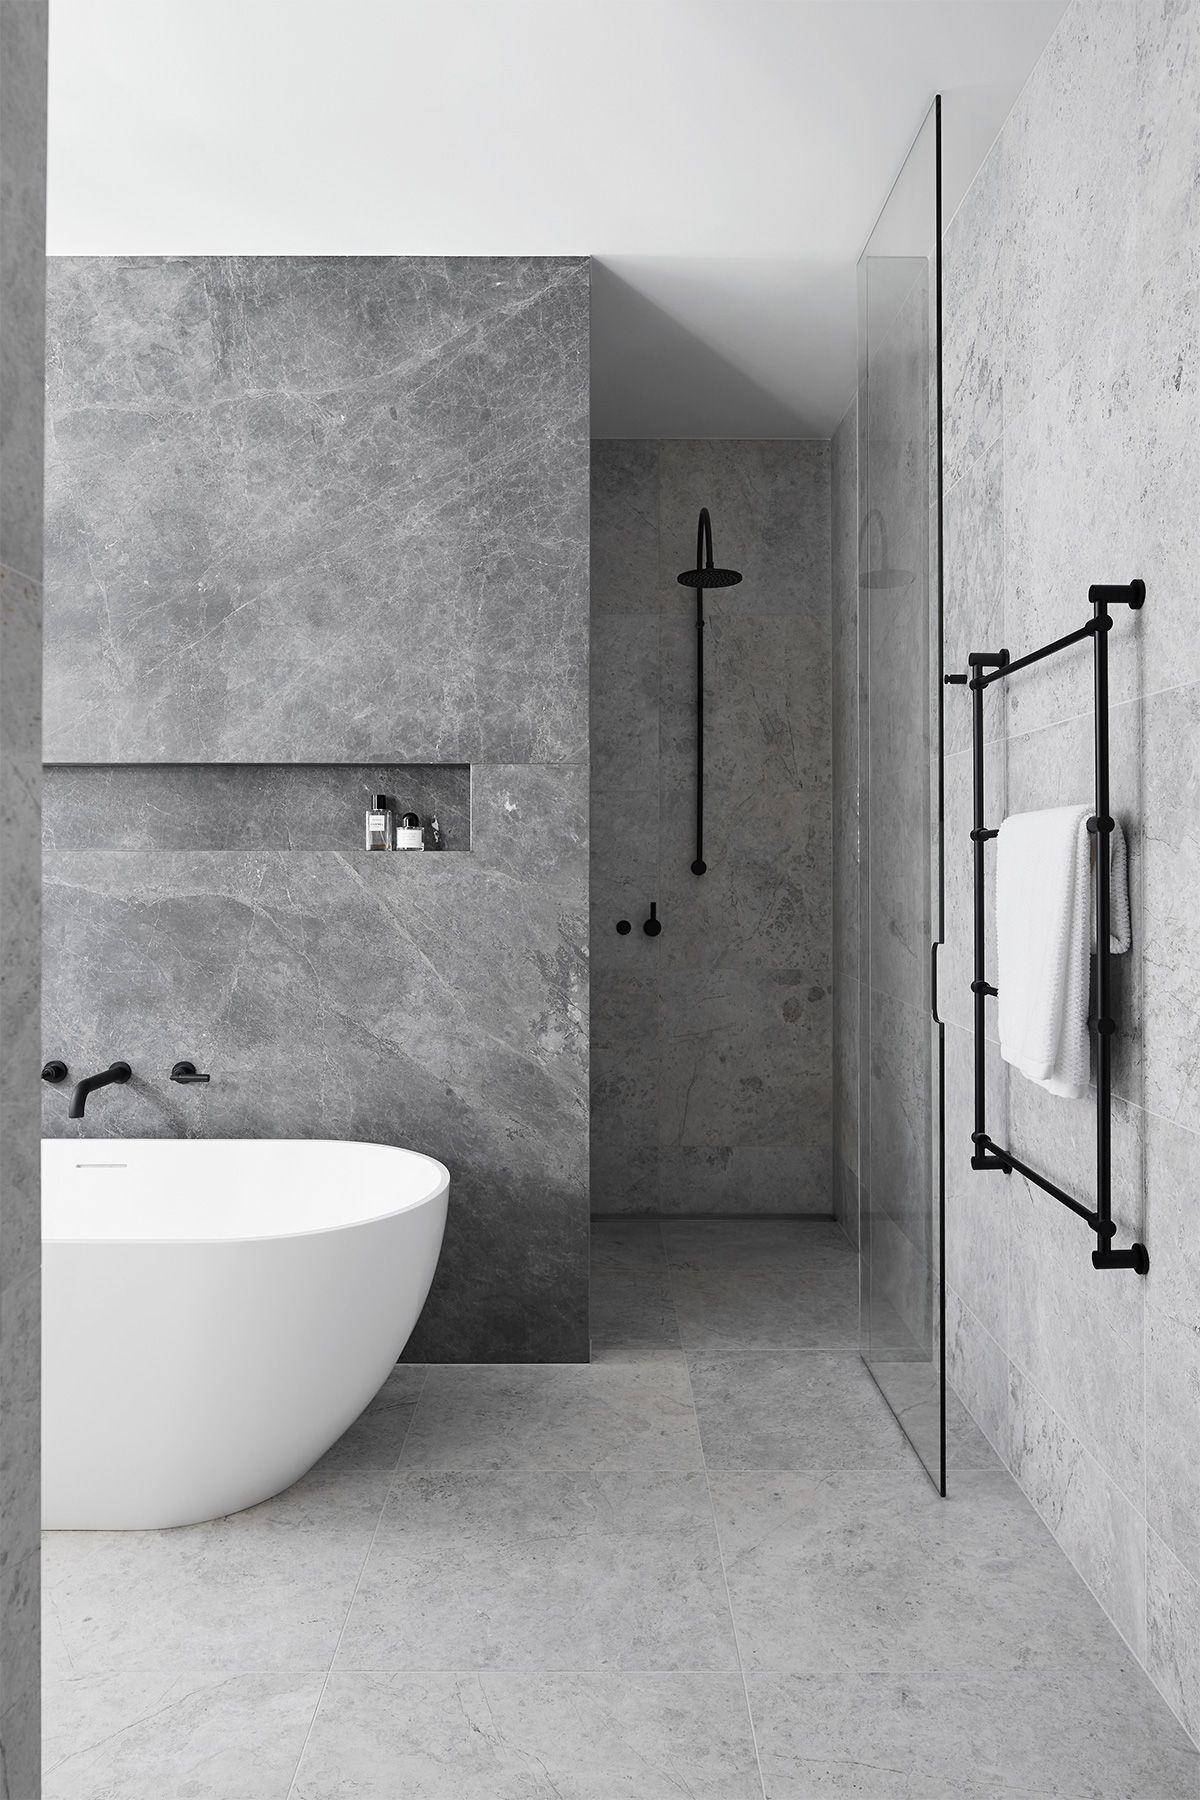 astounding calming modern minimalist bathroom white | TCL Residence - Mim Design | Grey bathrooms designs ...